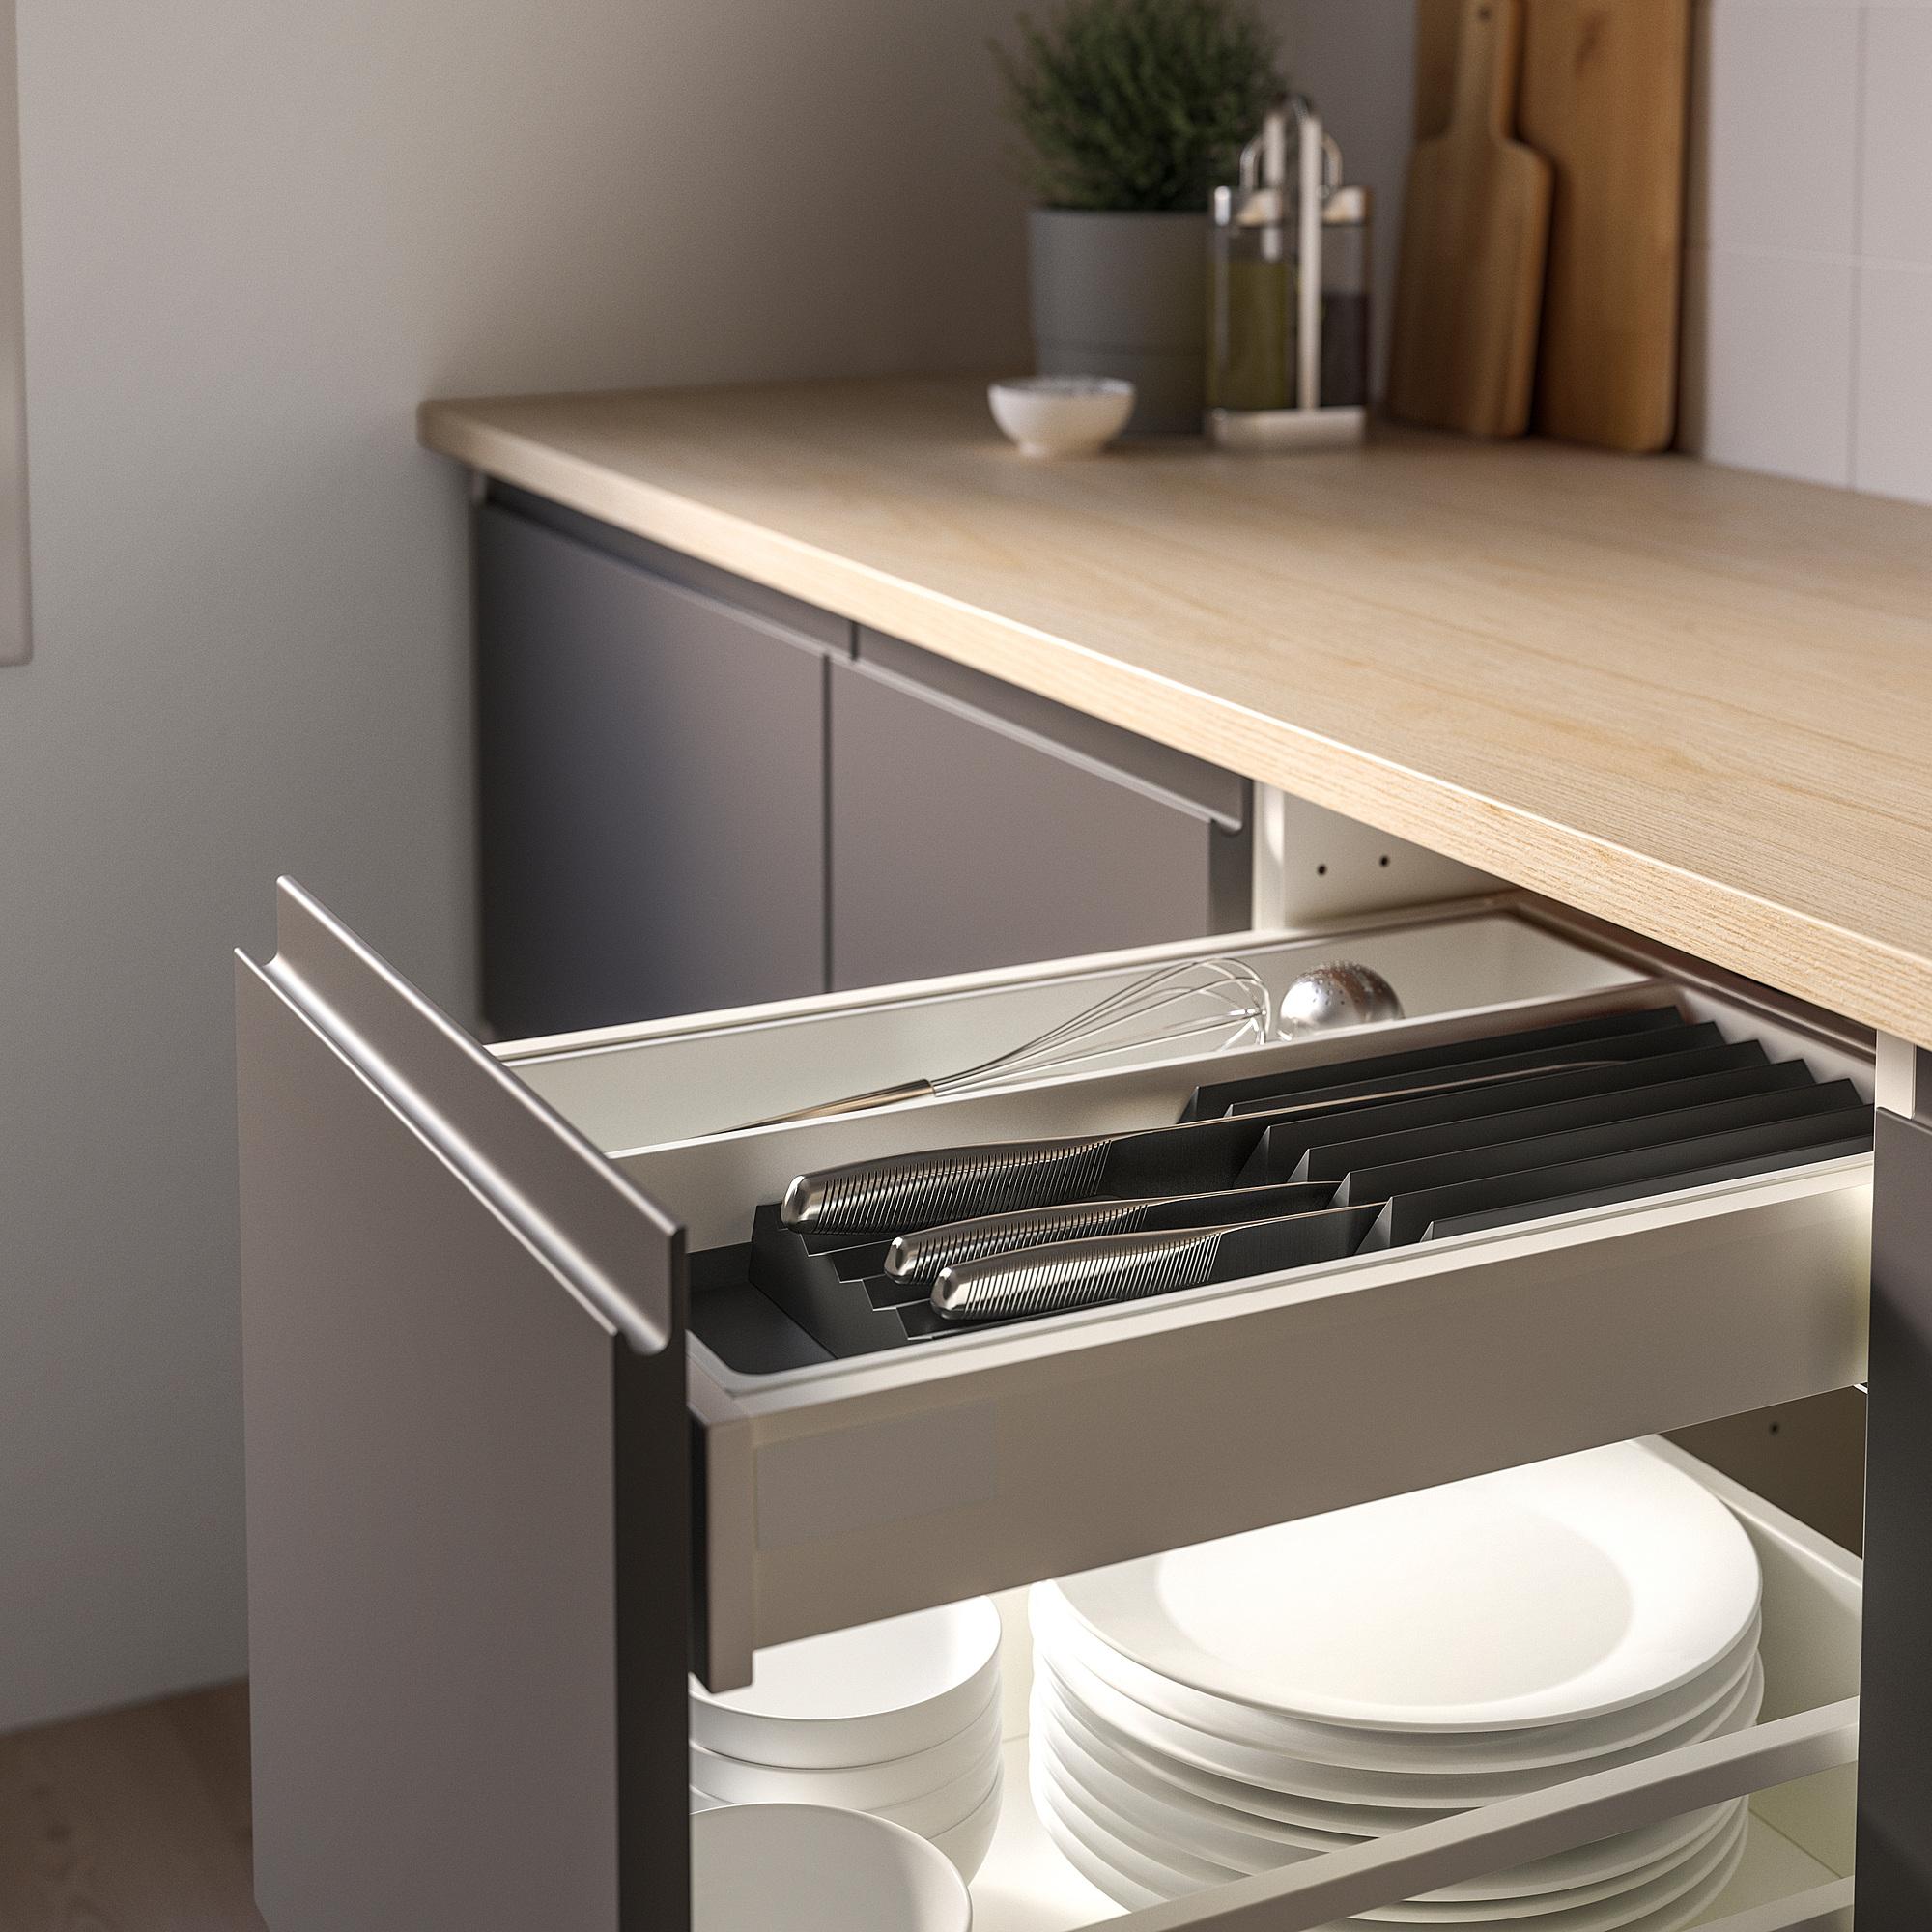 UPPDATERA adjustable add-on tray